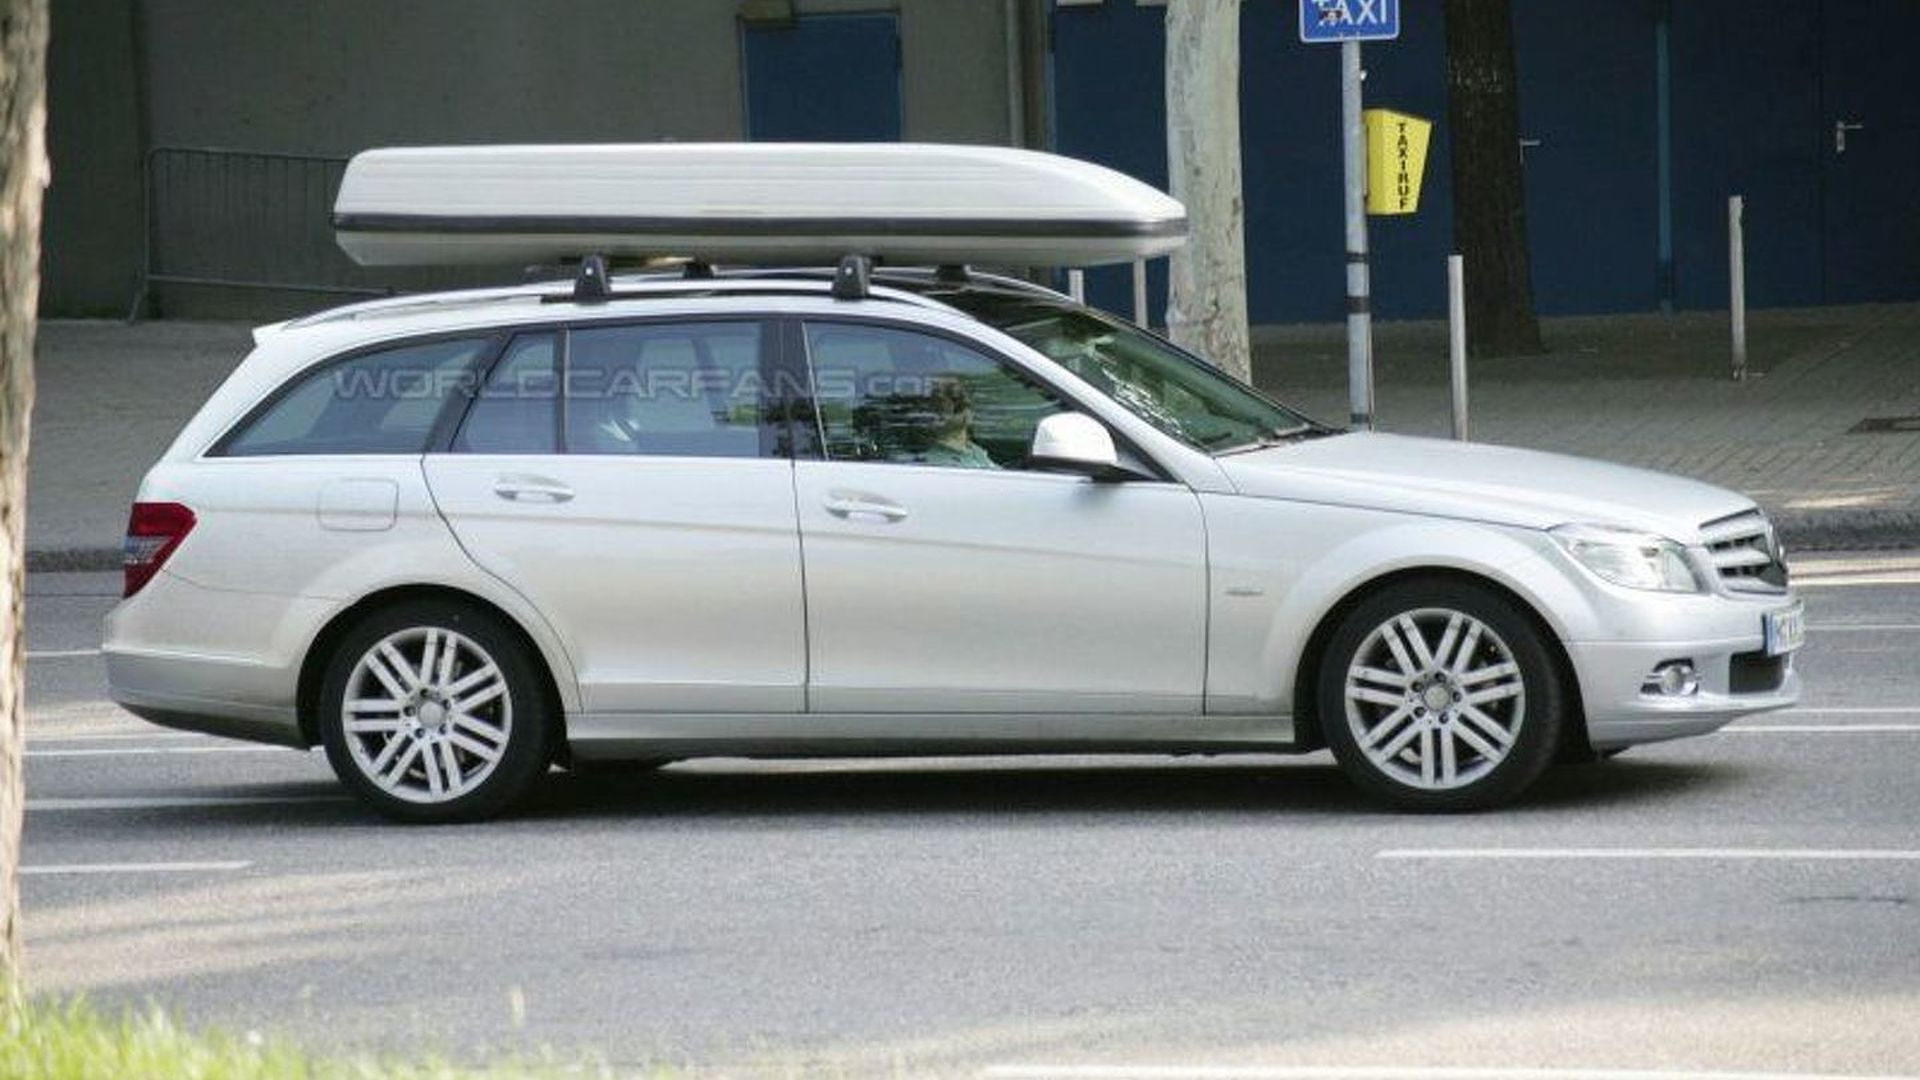 Mercedes c class wagon latest spy photos for Mercedes benz c300 roof rack